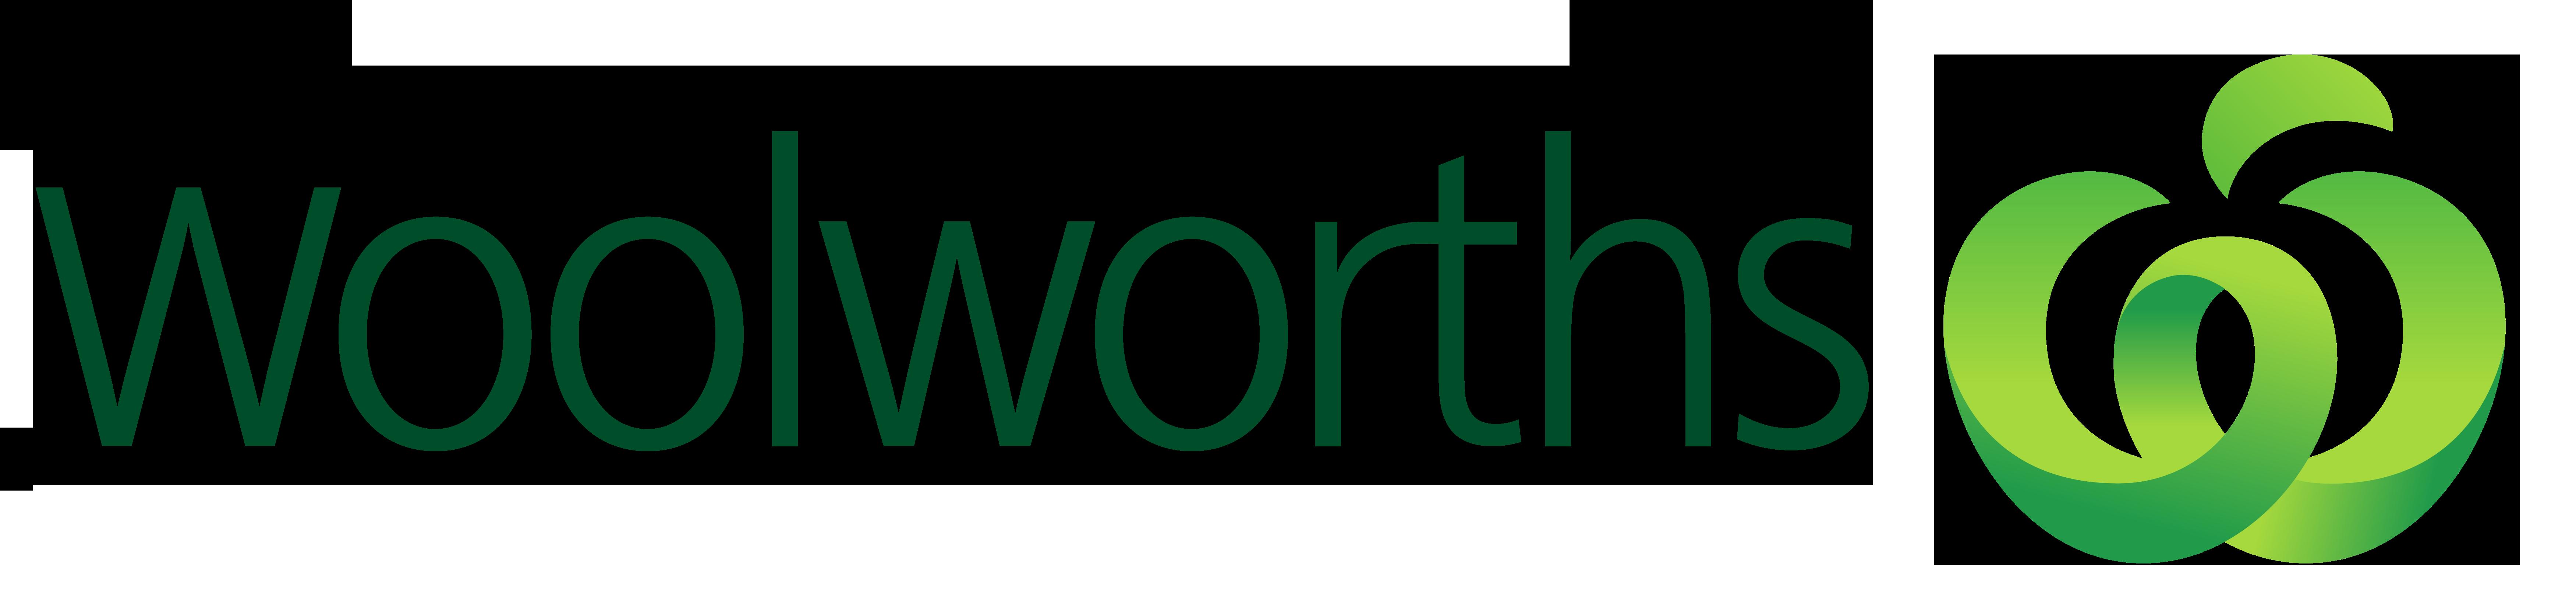 woolworths logos download walmart canada vector logo walmart foundation logo vector